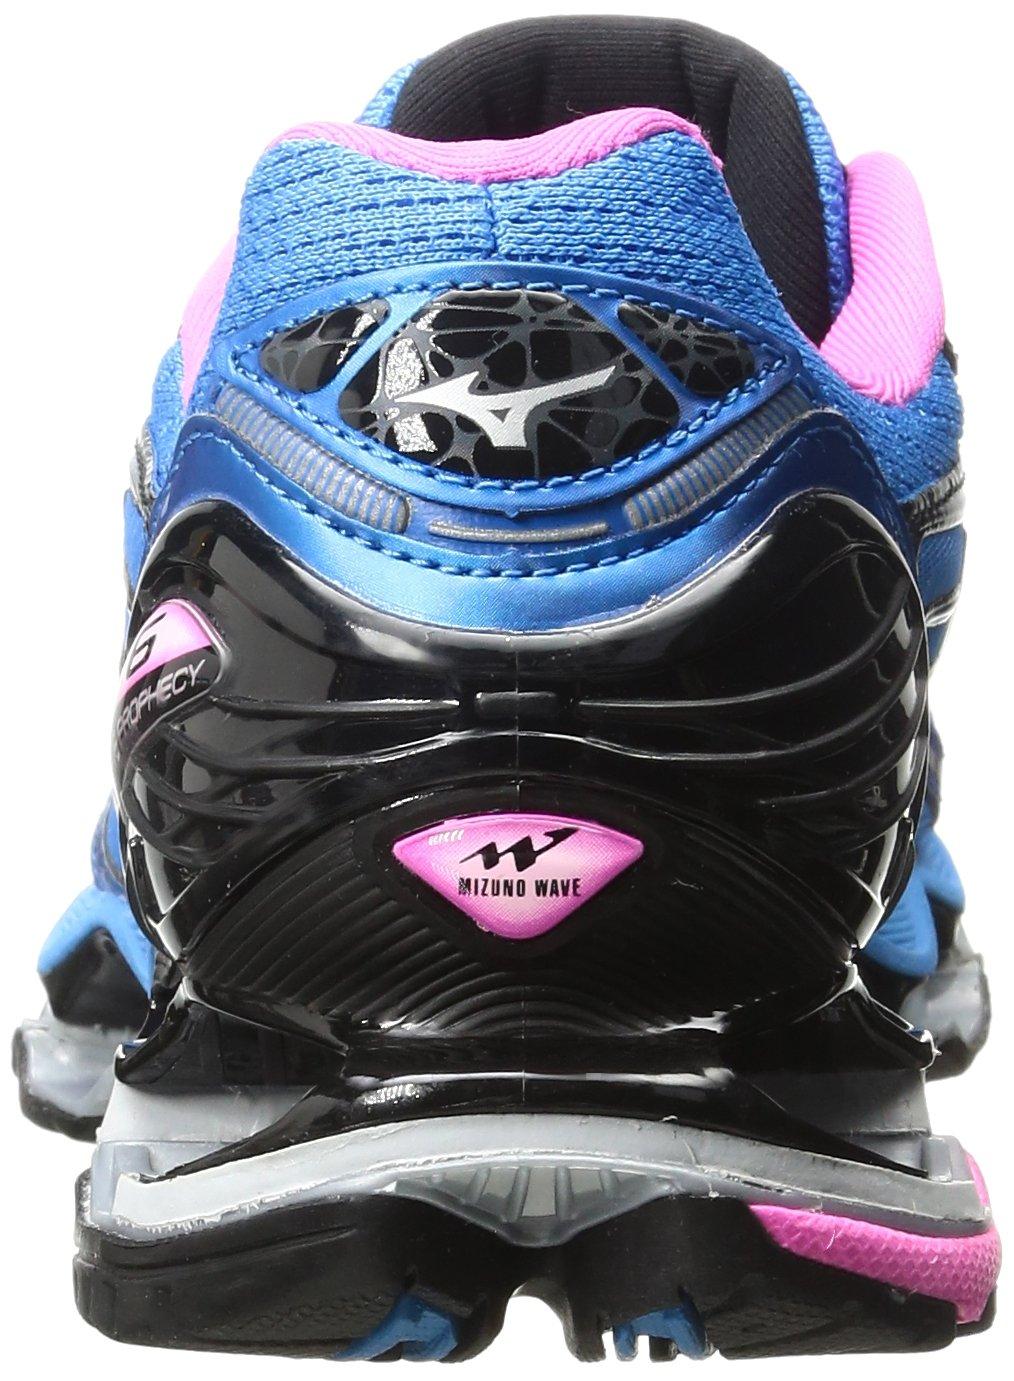 Mizuno Women's Wave Prophecy 6 Running Shoe B01H4X9M36 10 B(M) US|Diva Blue-silver